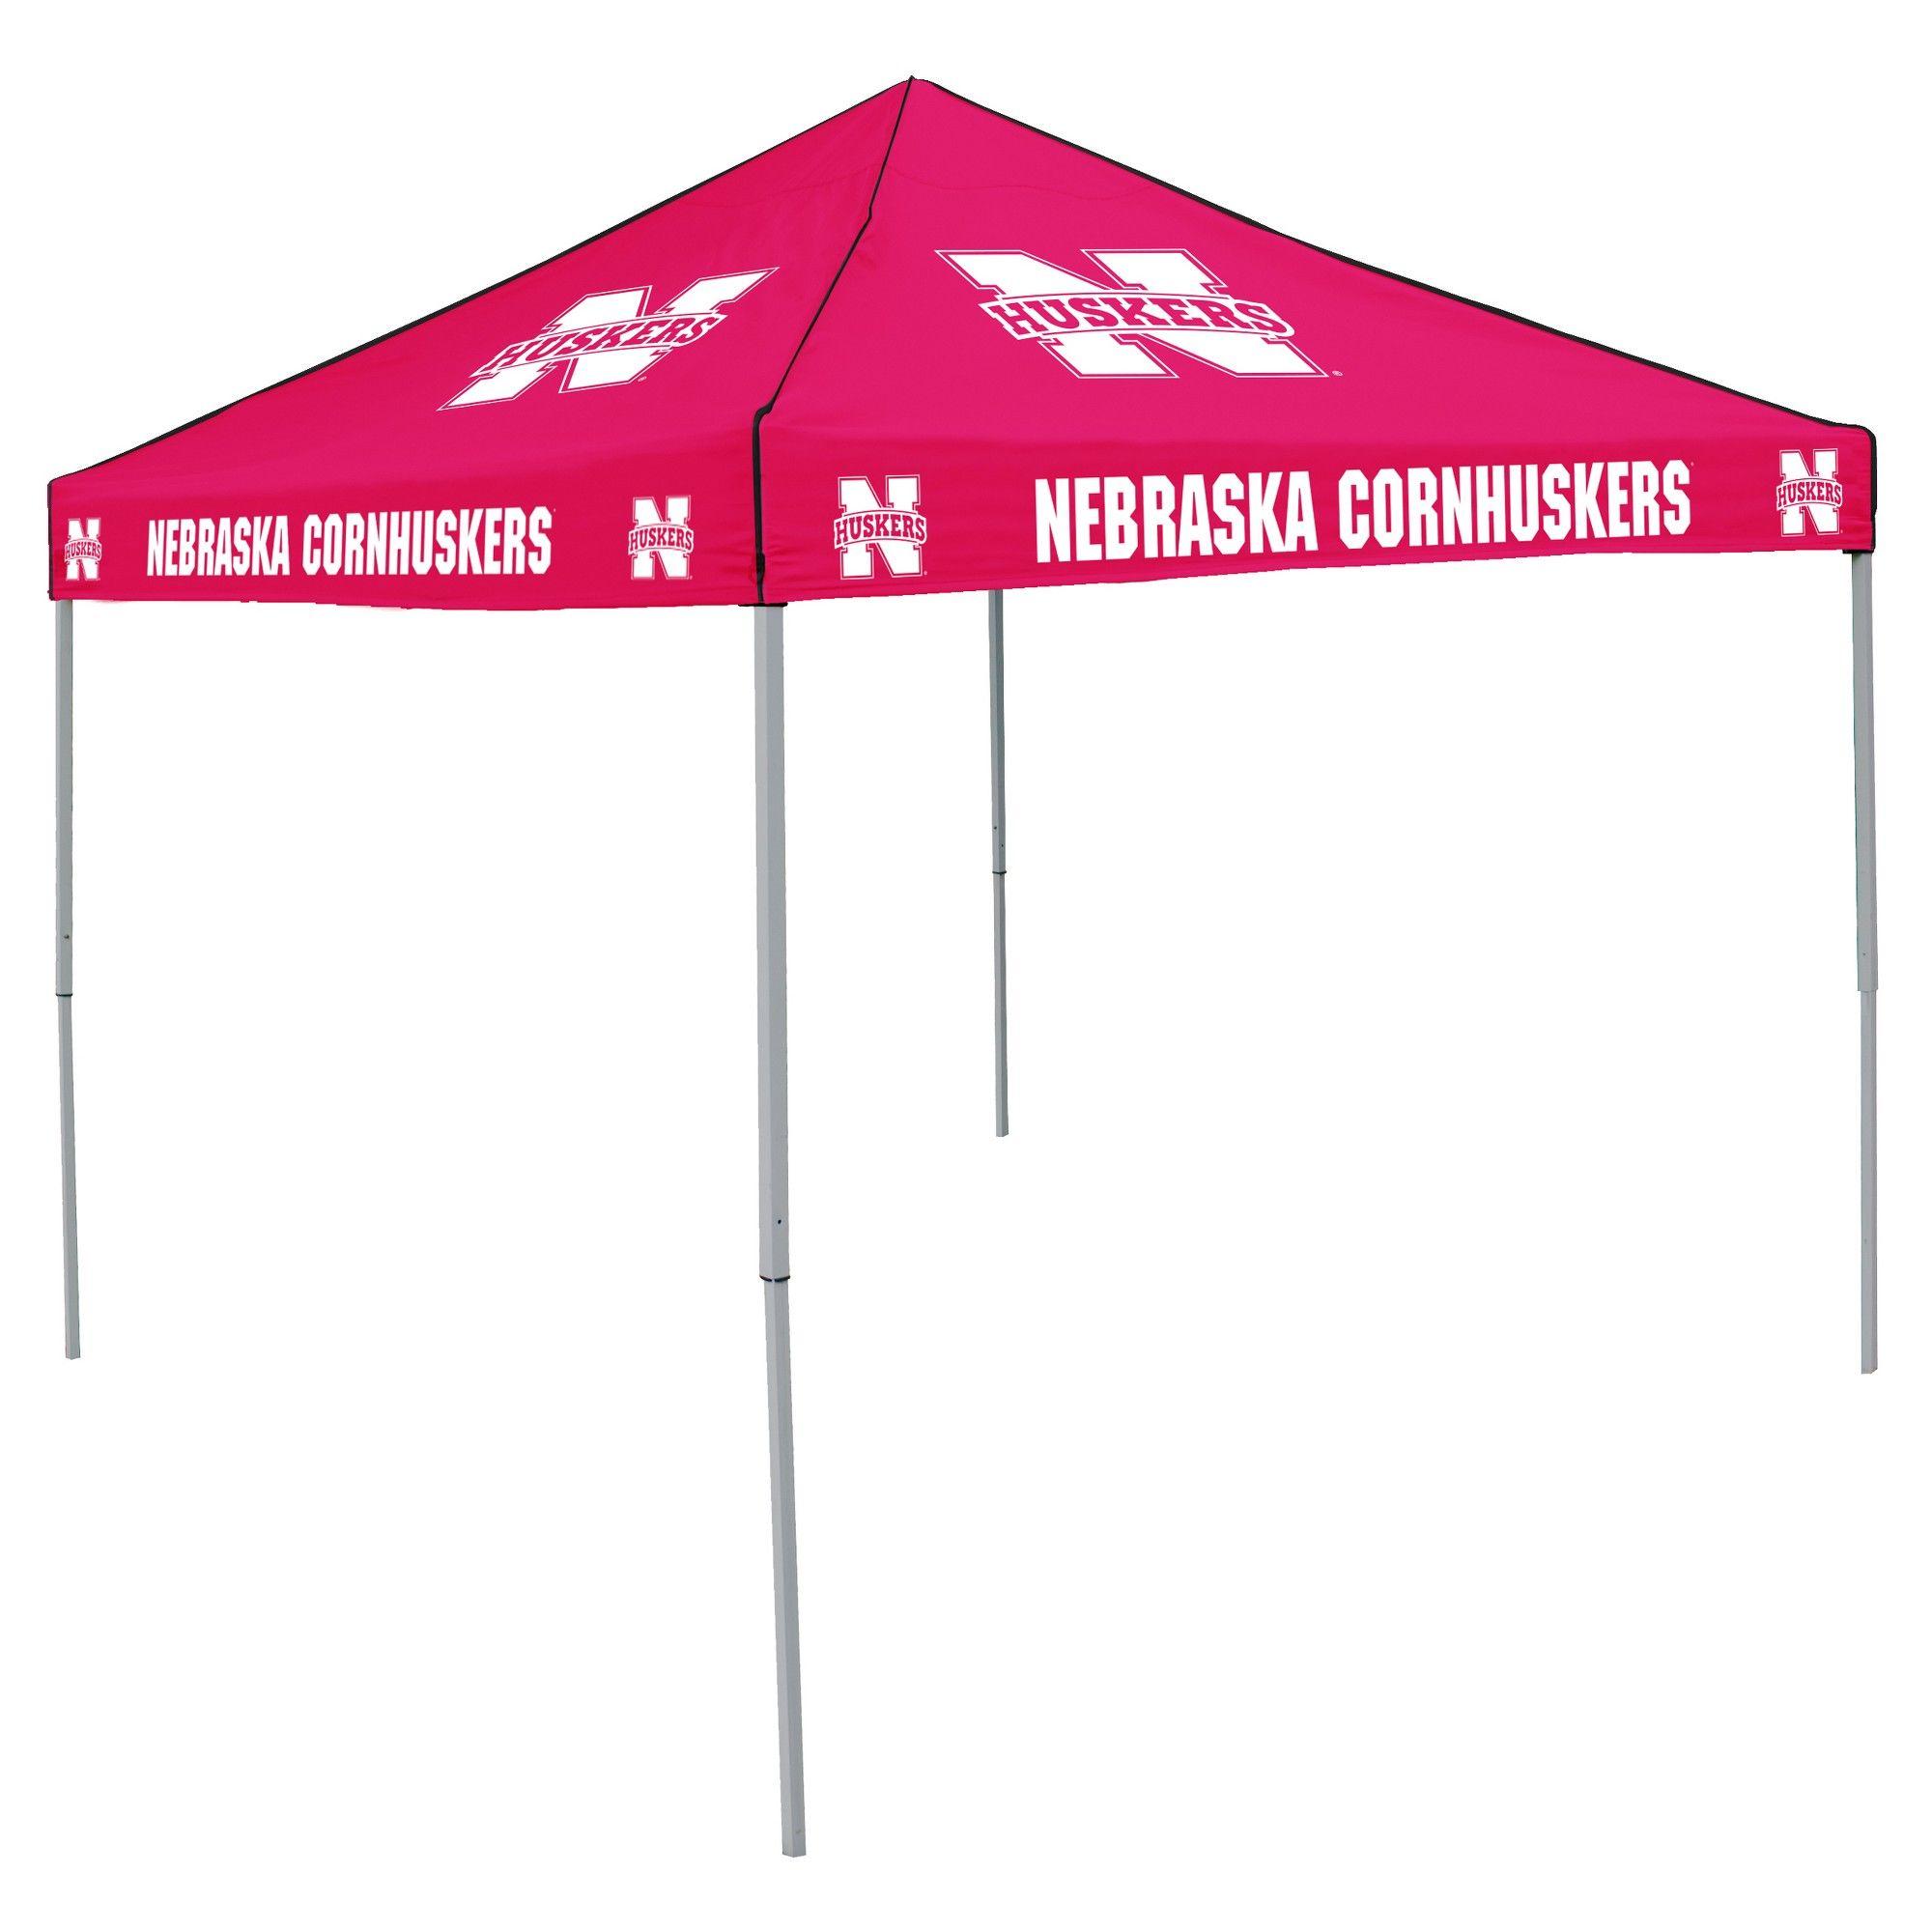 NCAA Nebraska Cornhuskers Logo Brands 9x9 Canopy Tent  sc 1 st  Pinterest & NCAA Nebraska Cornhuskers Logo Brands 9x9 Canopy Tent | Canopy ...